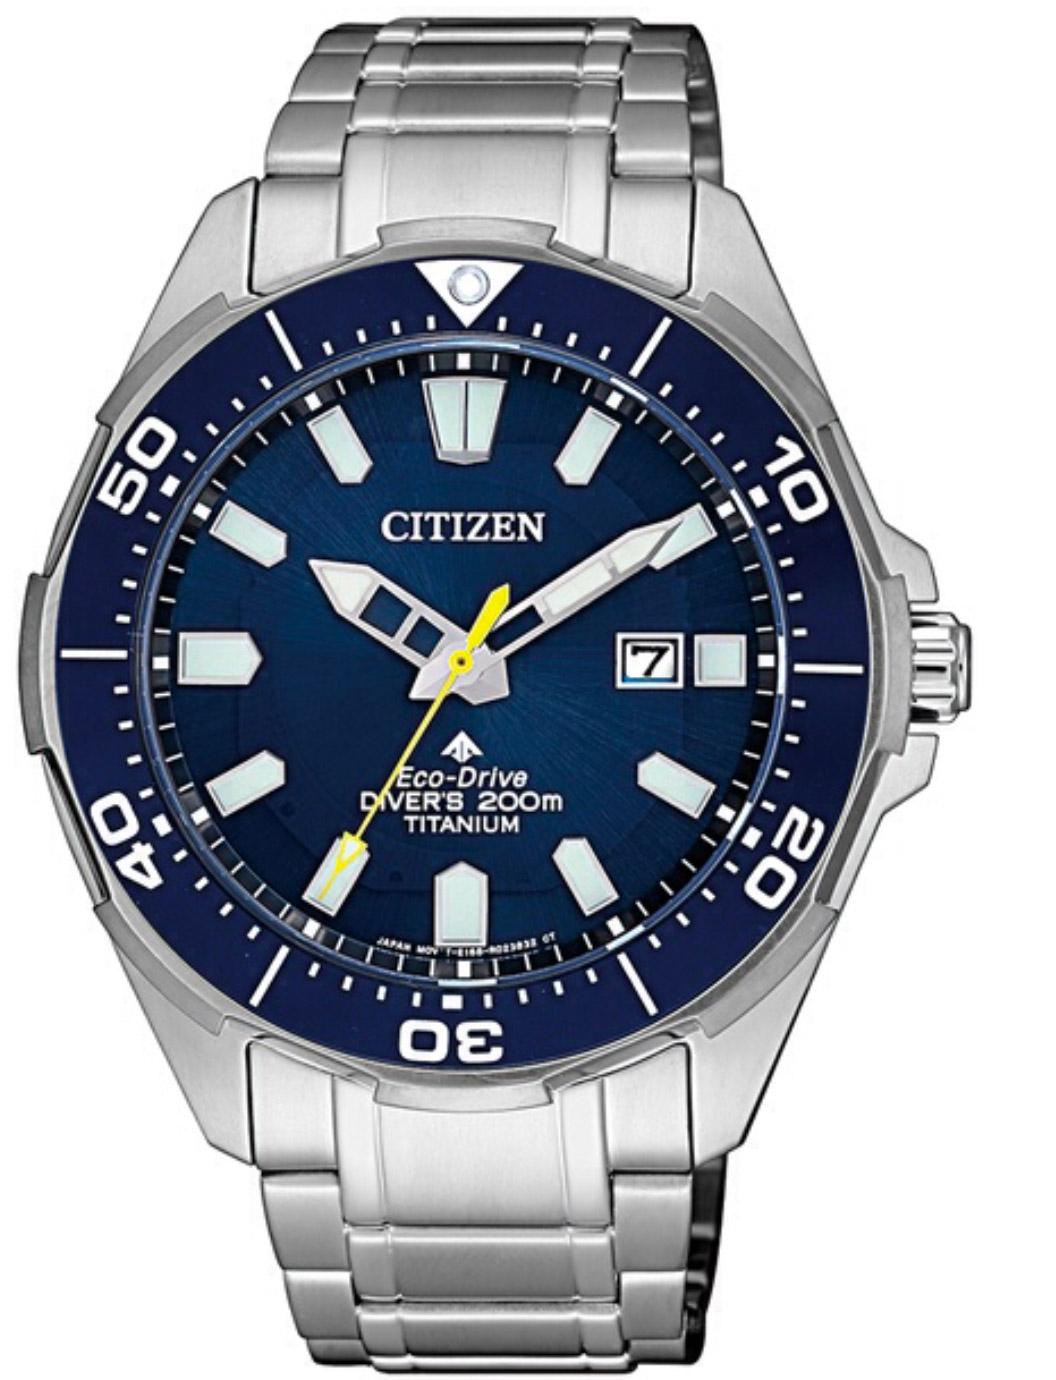 Citizen Diver's Supertitanio - Quadrante blu, cassa e bracciale Supertitanio